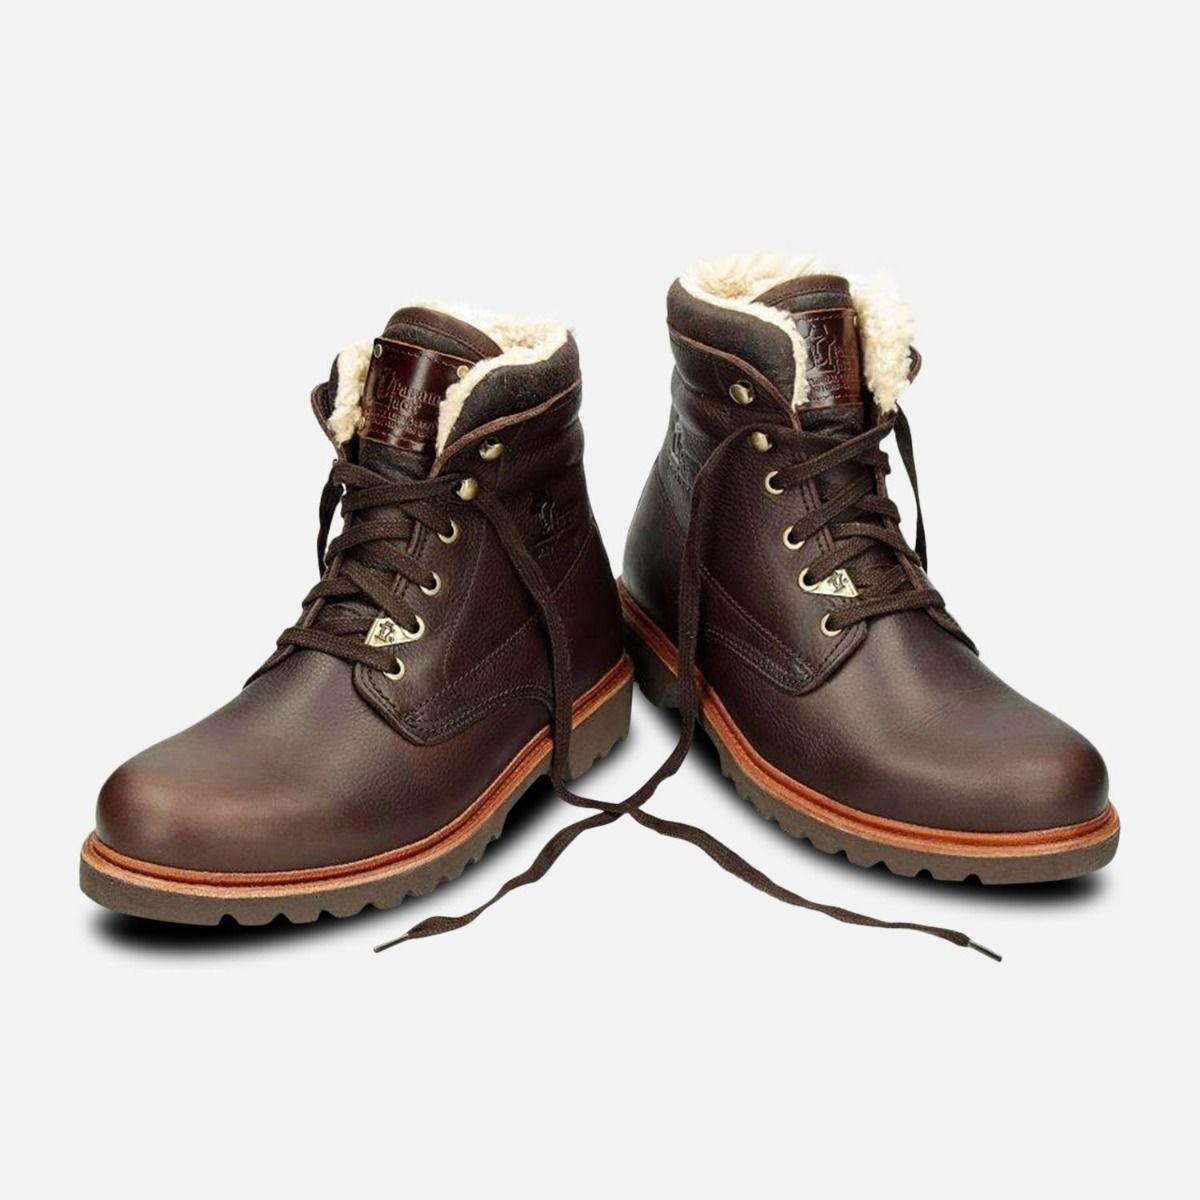 Havana Joe Mens Warm Lined Aviator Boots in Brown